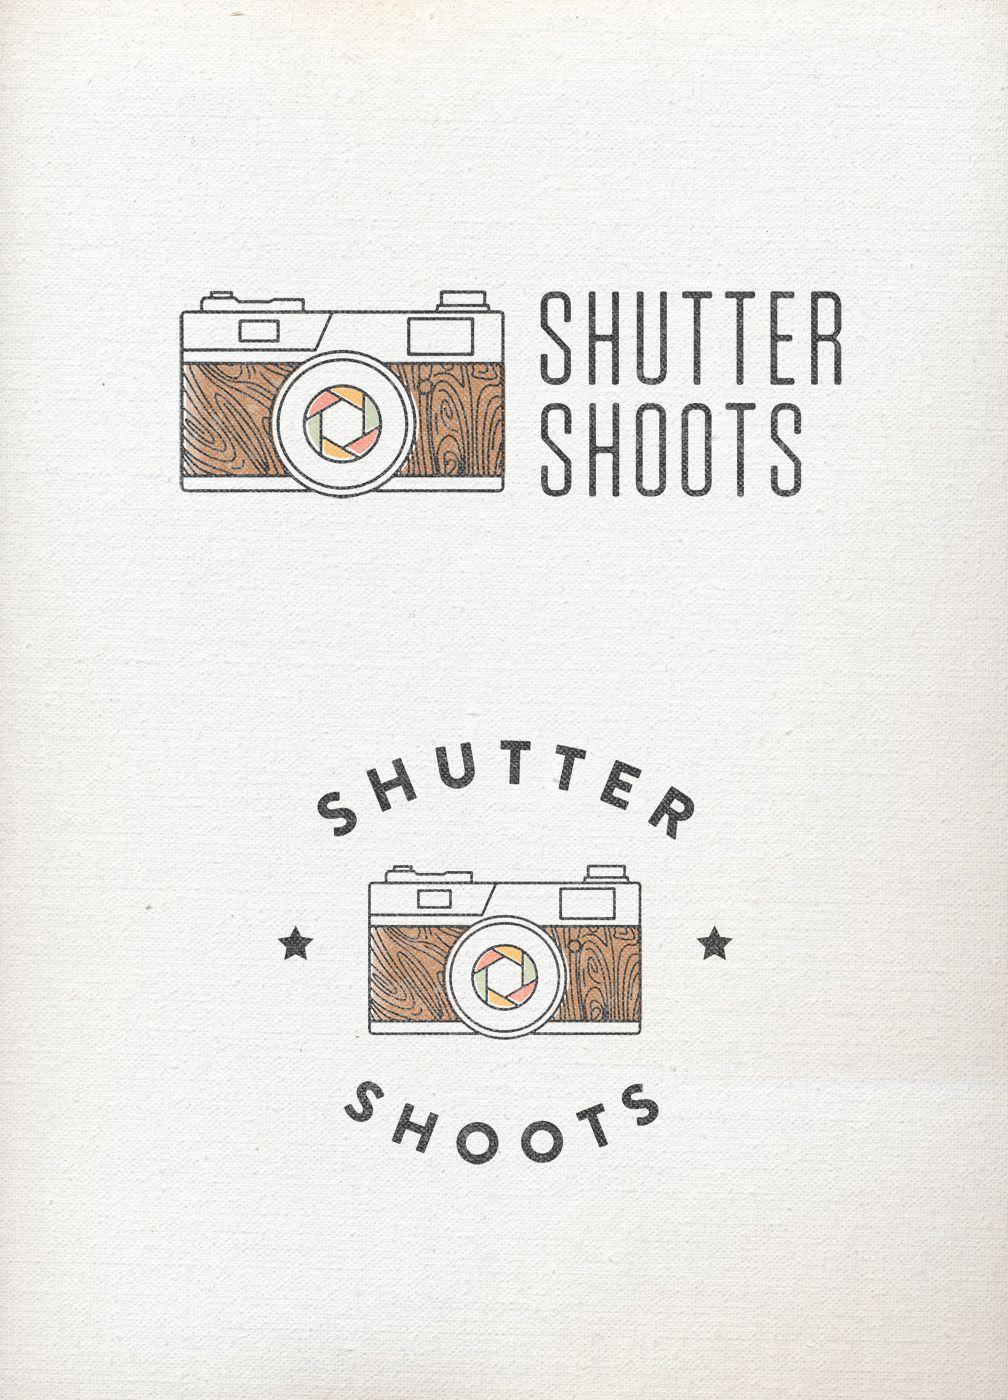 October 2012: Shutter Shoots logo by Design Press